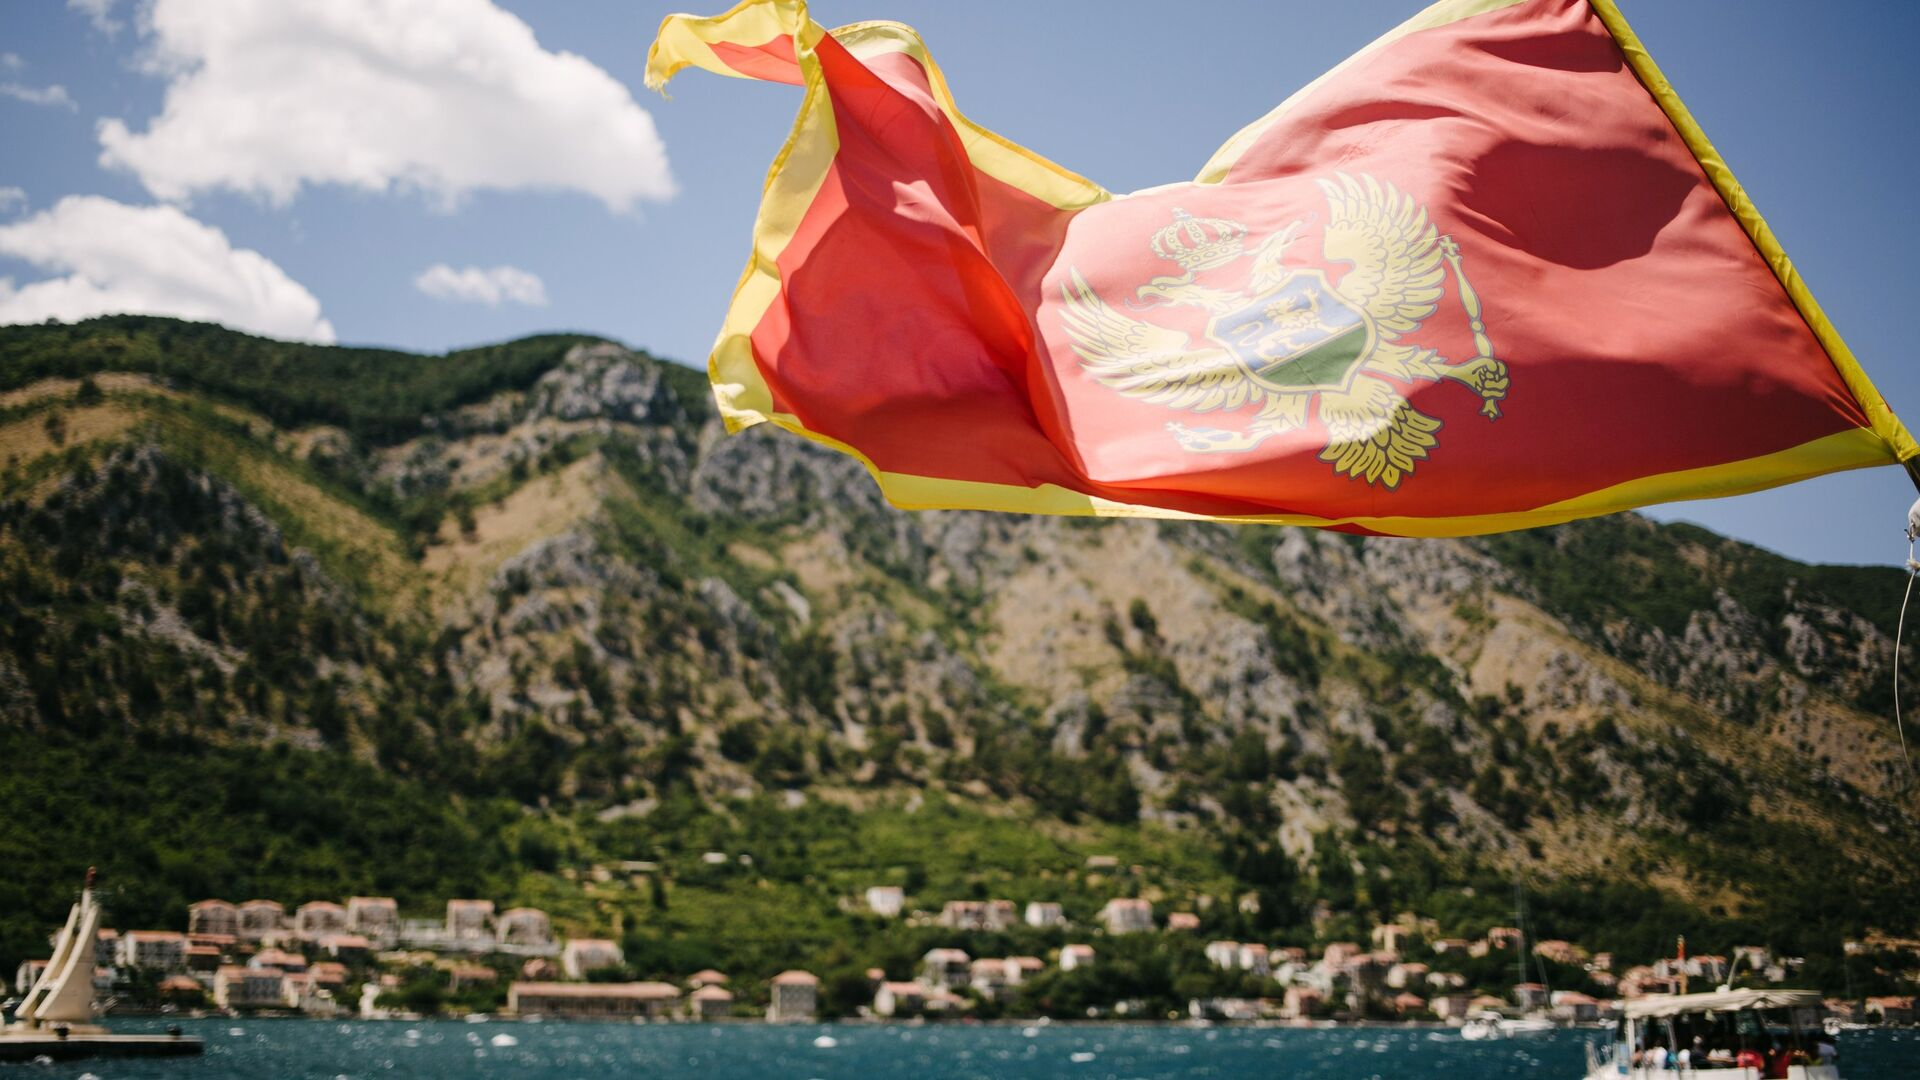 Флаг Черногории на фоне города Котор - РИА Новости, 1920, 01.09.2020